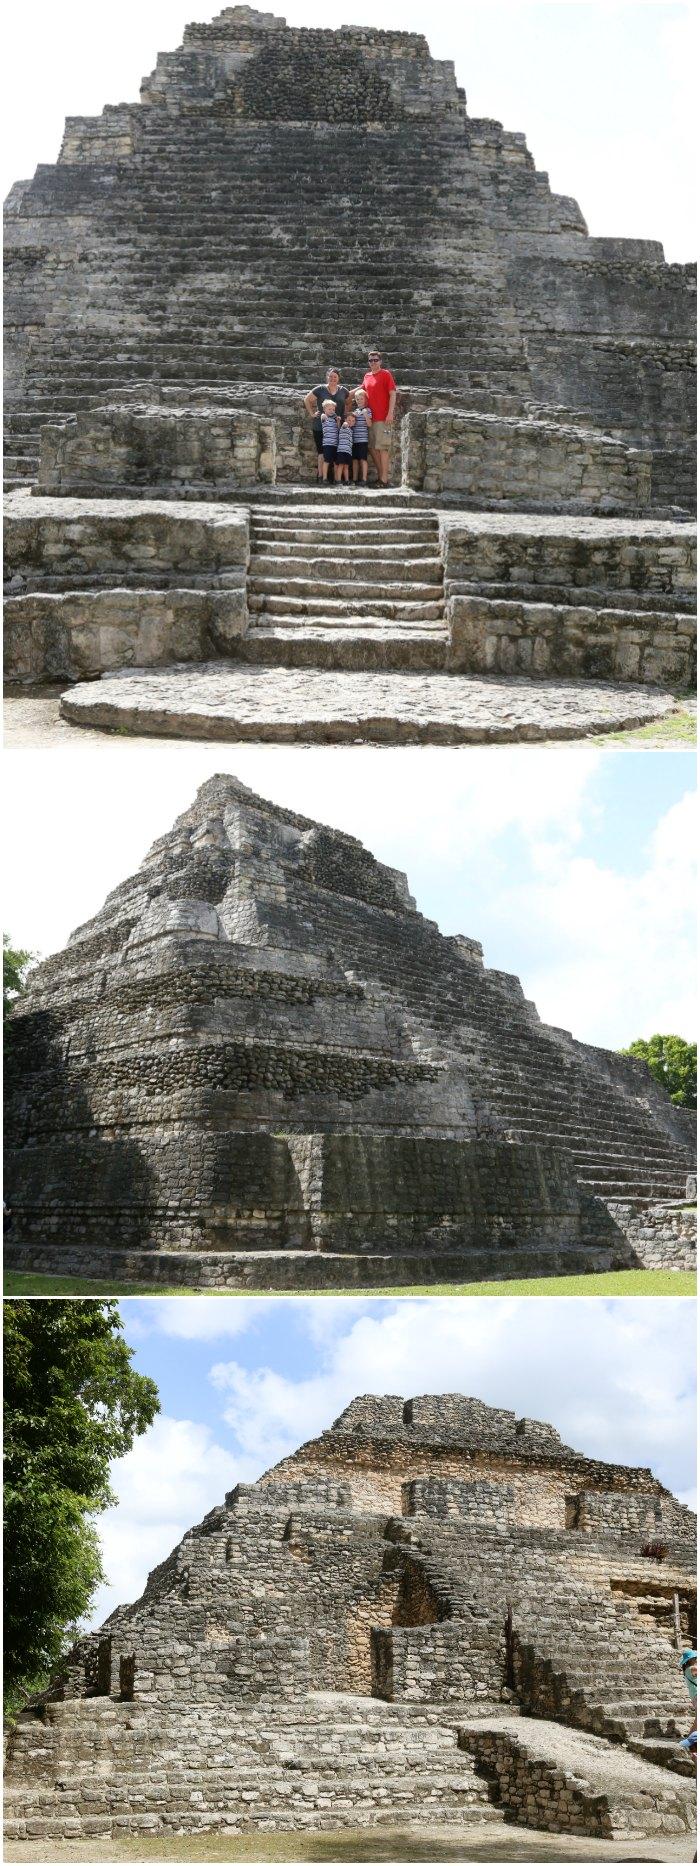 Chacchoben Mayan Site